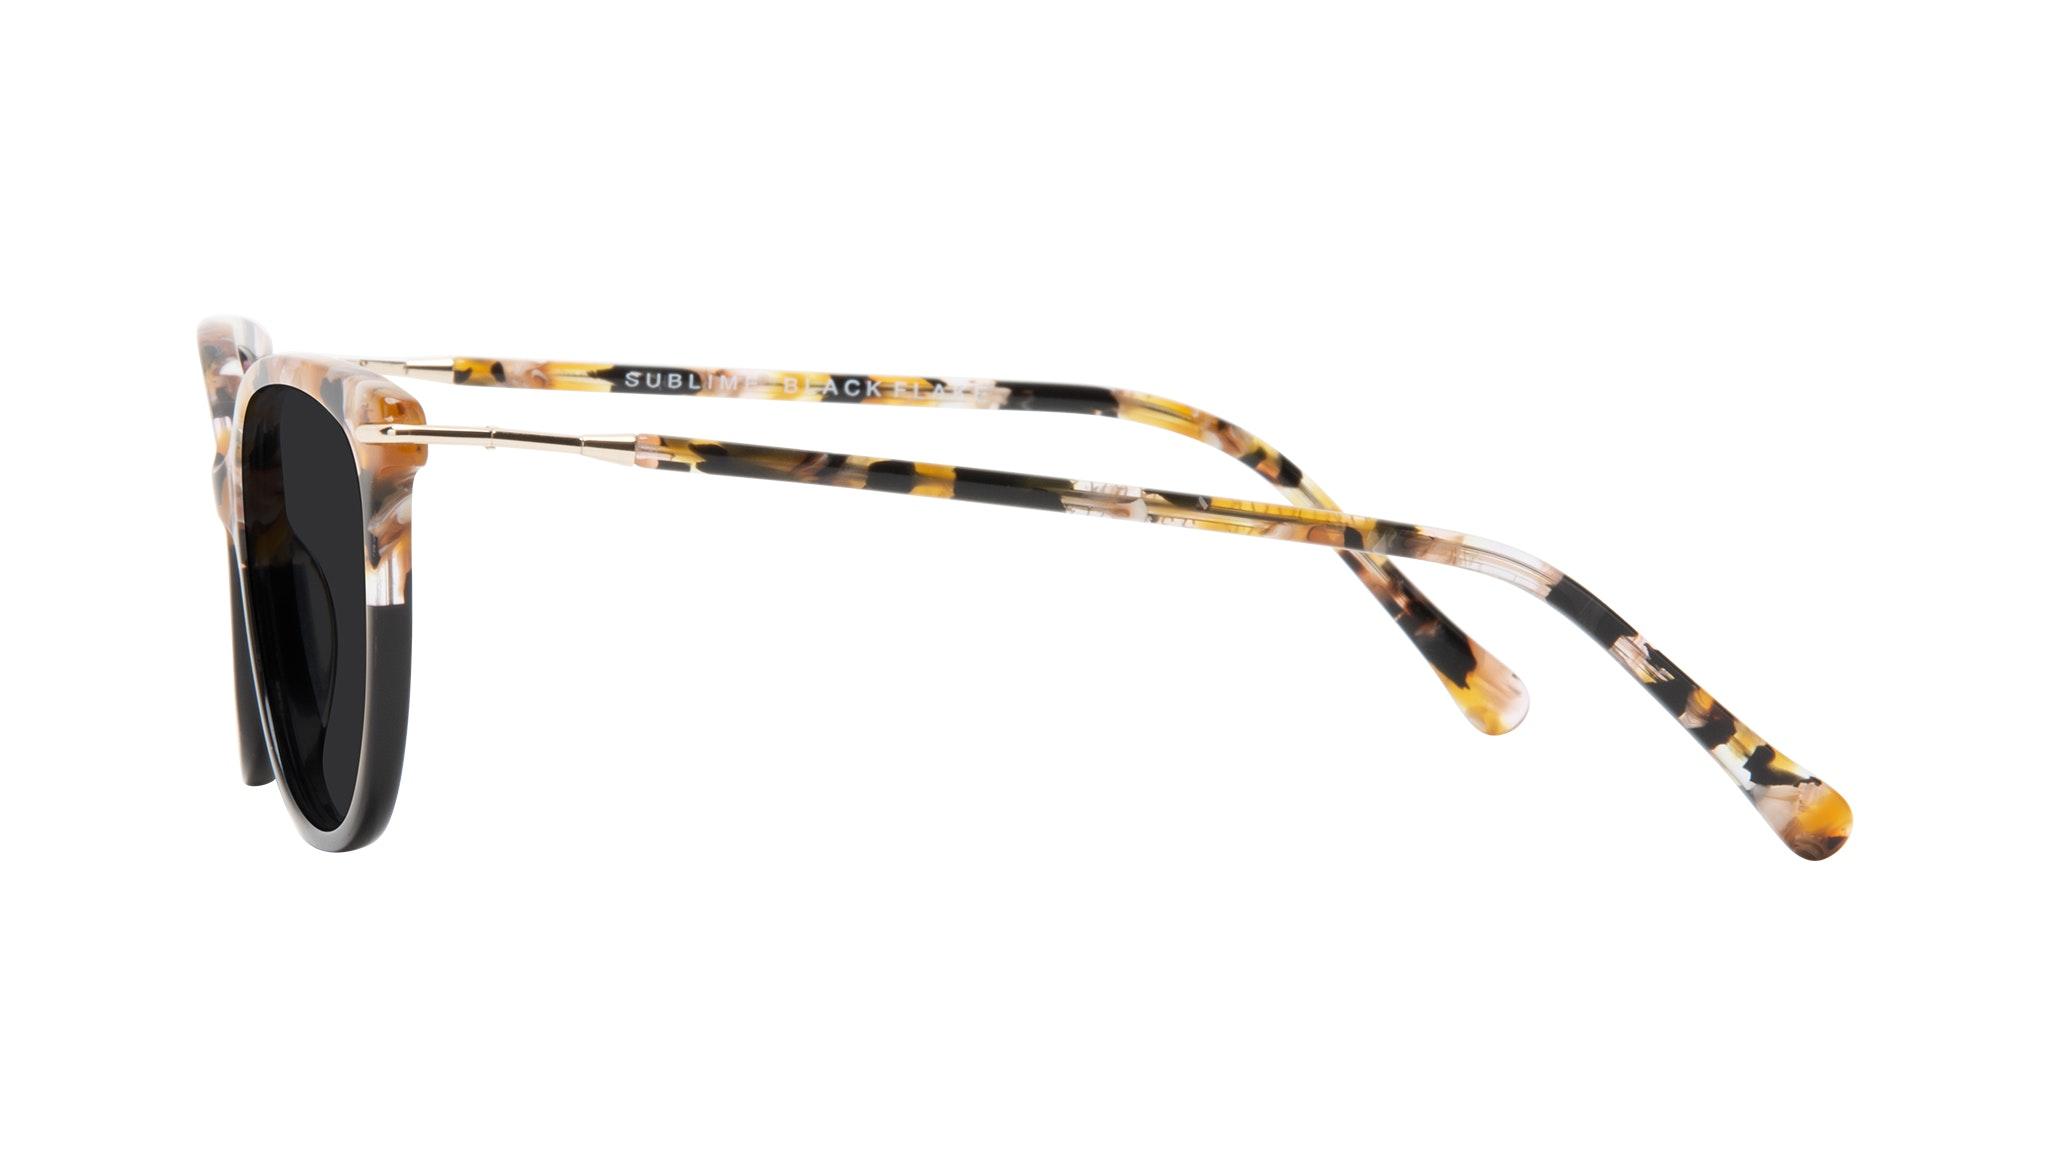 Affordable Fashion Glasses Round Sunglasses Women Sublime Black Flake Side